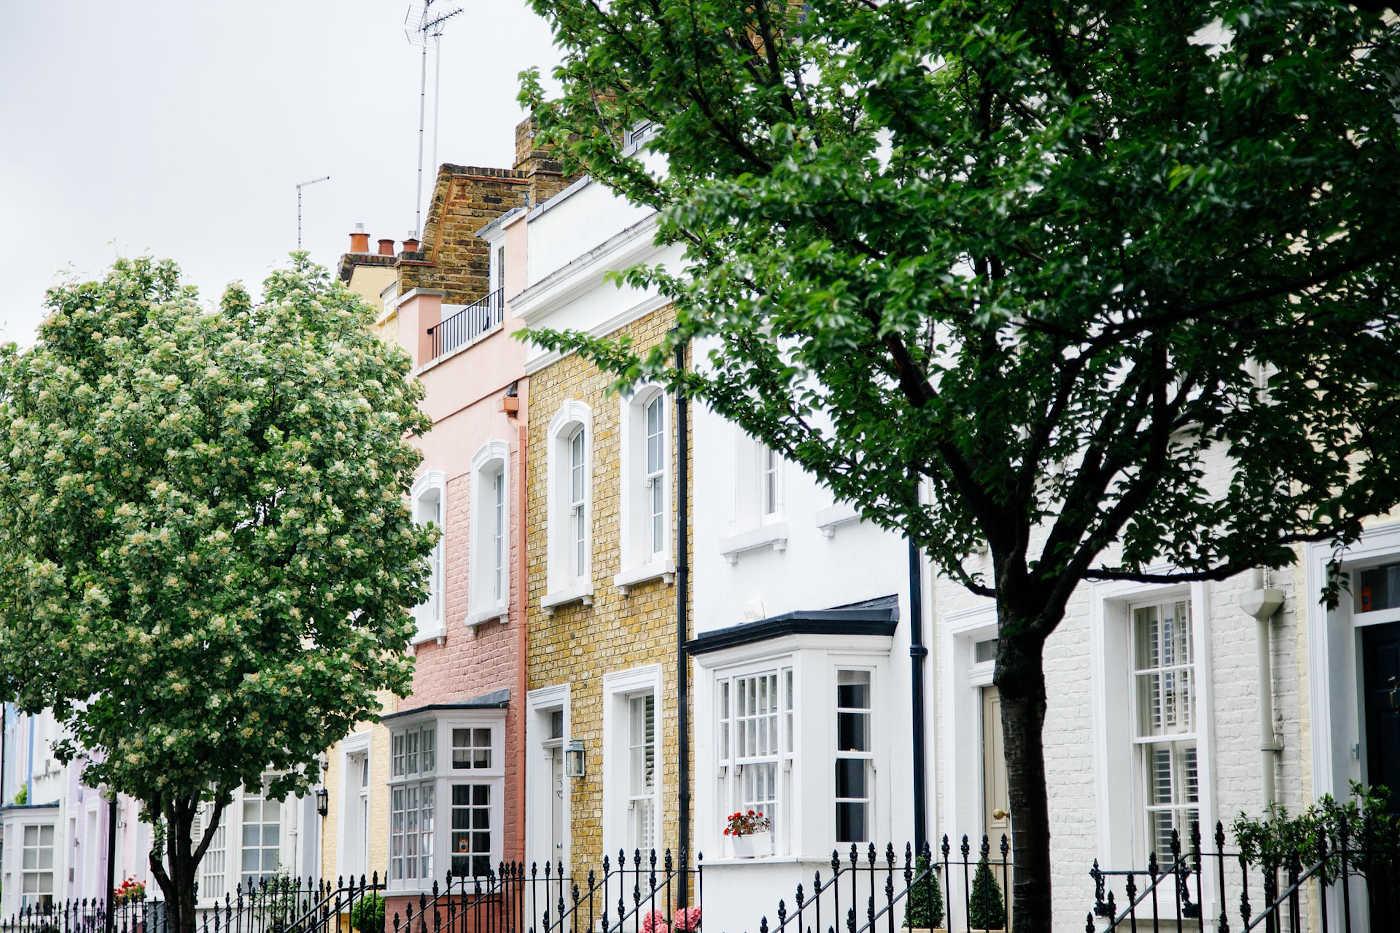 Chelsea i London